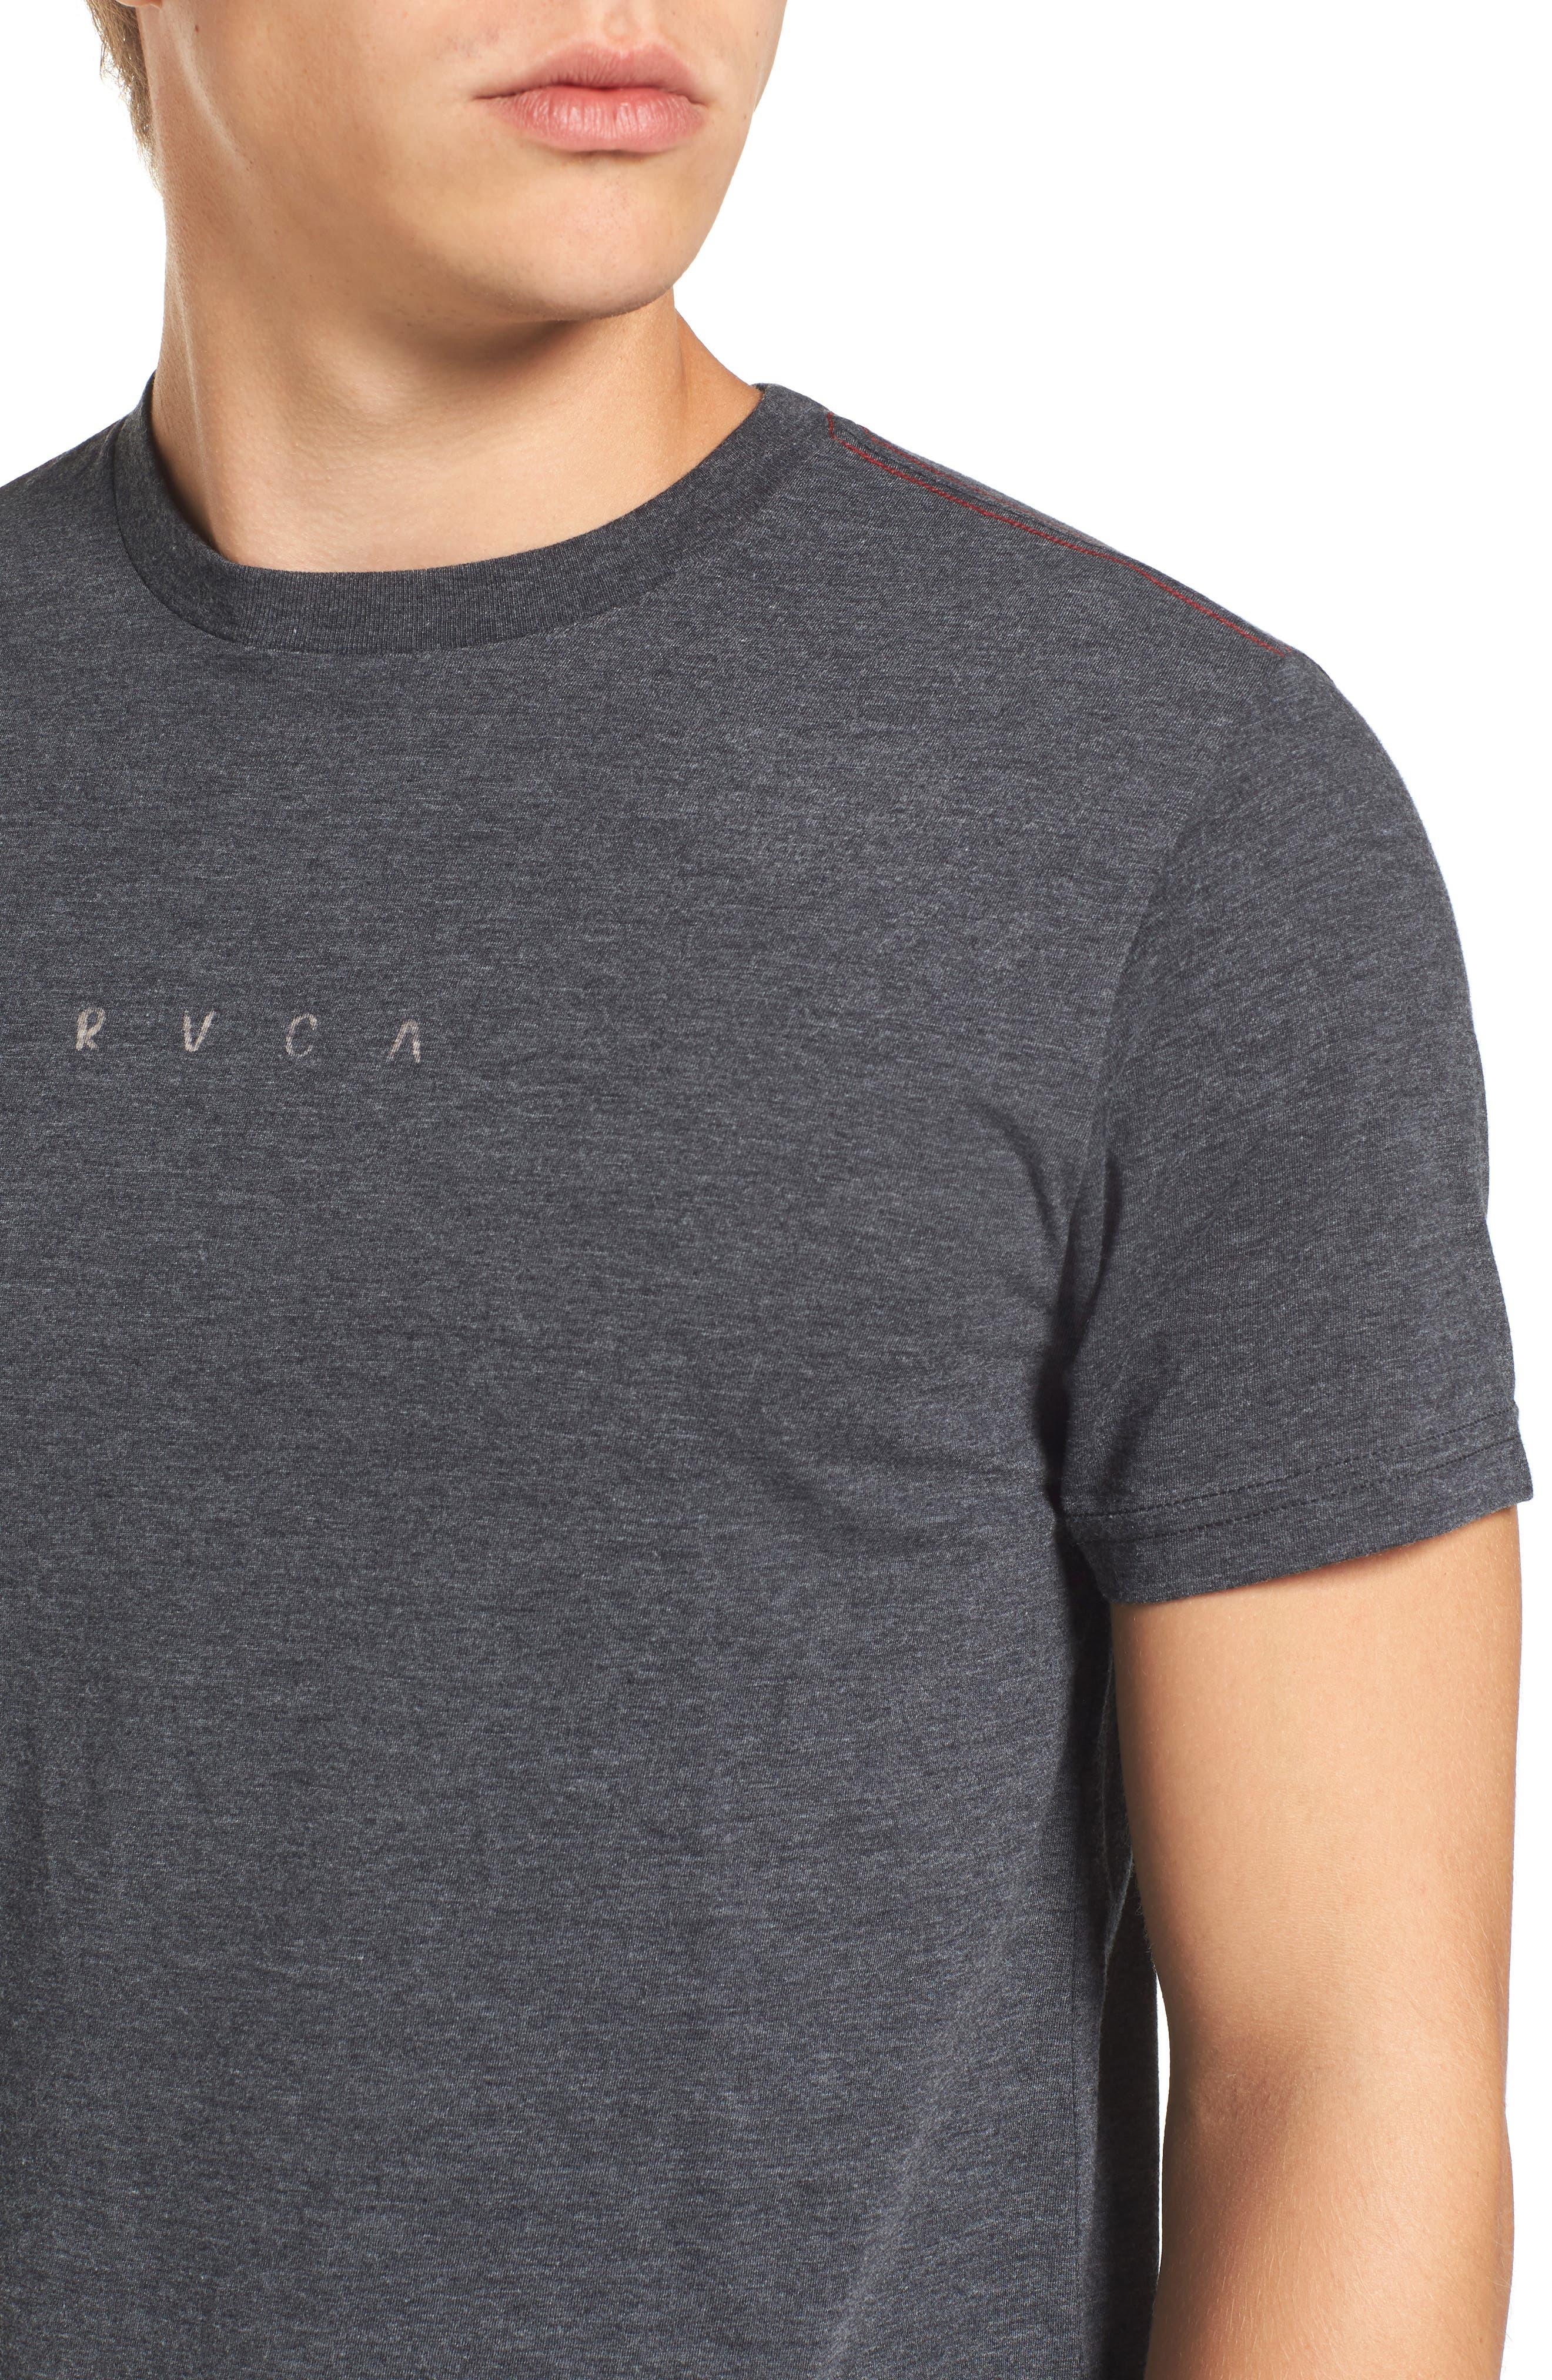 Snooze Cloud Graphic T-Shirt,                             Alternate thumbnail 4, color,                             001